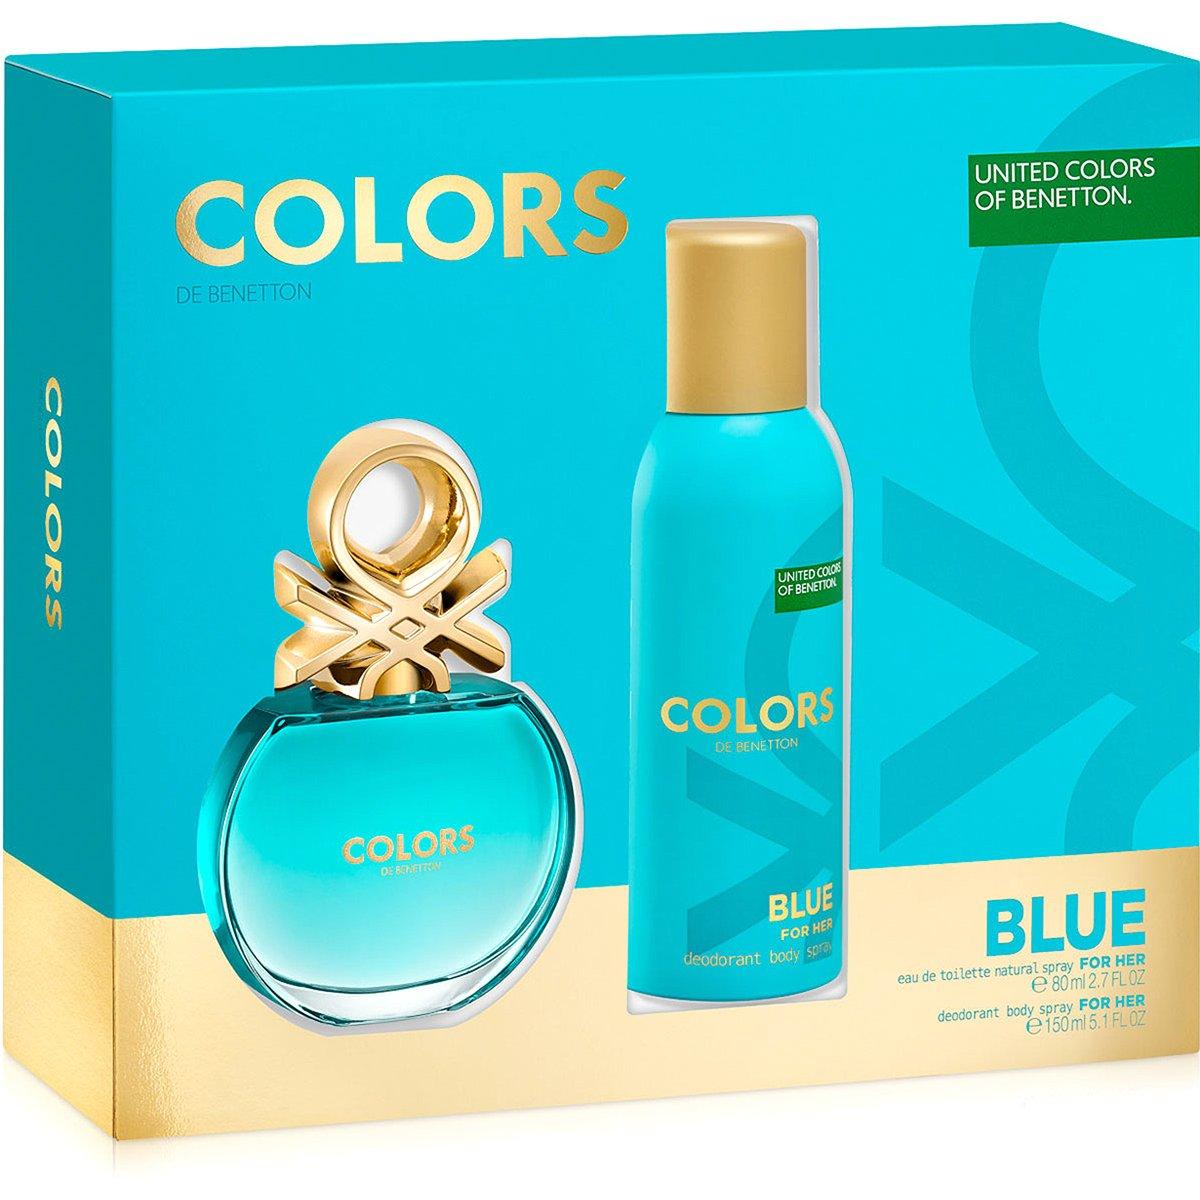 bc3df8ccdce Benetton Kit Perfume Feminino Colors Blue Est EDT 80ml + Desodorante 150ml  - Compre Agora